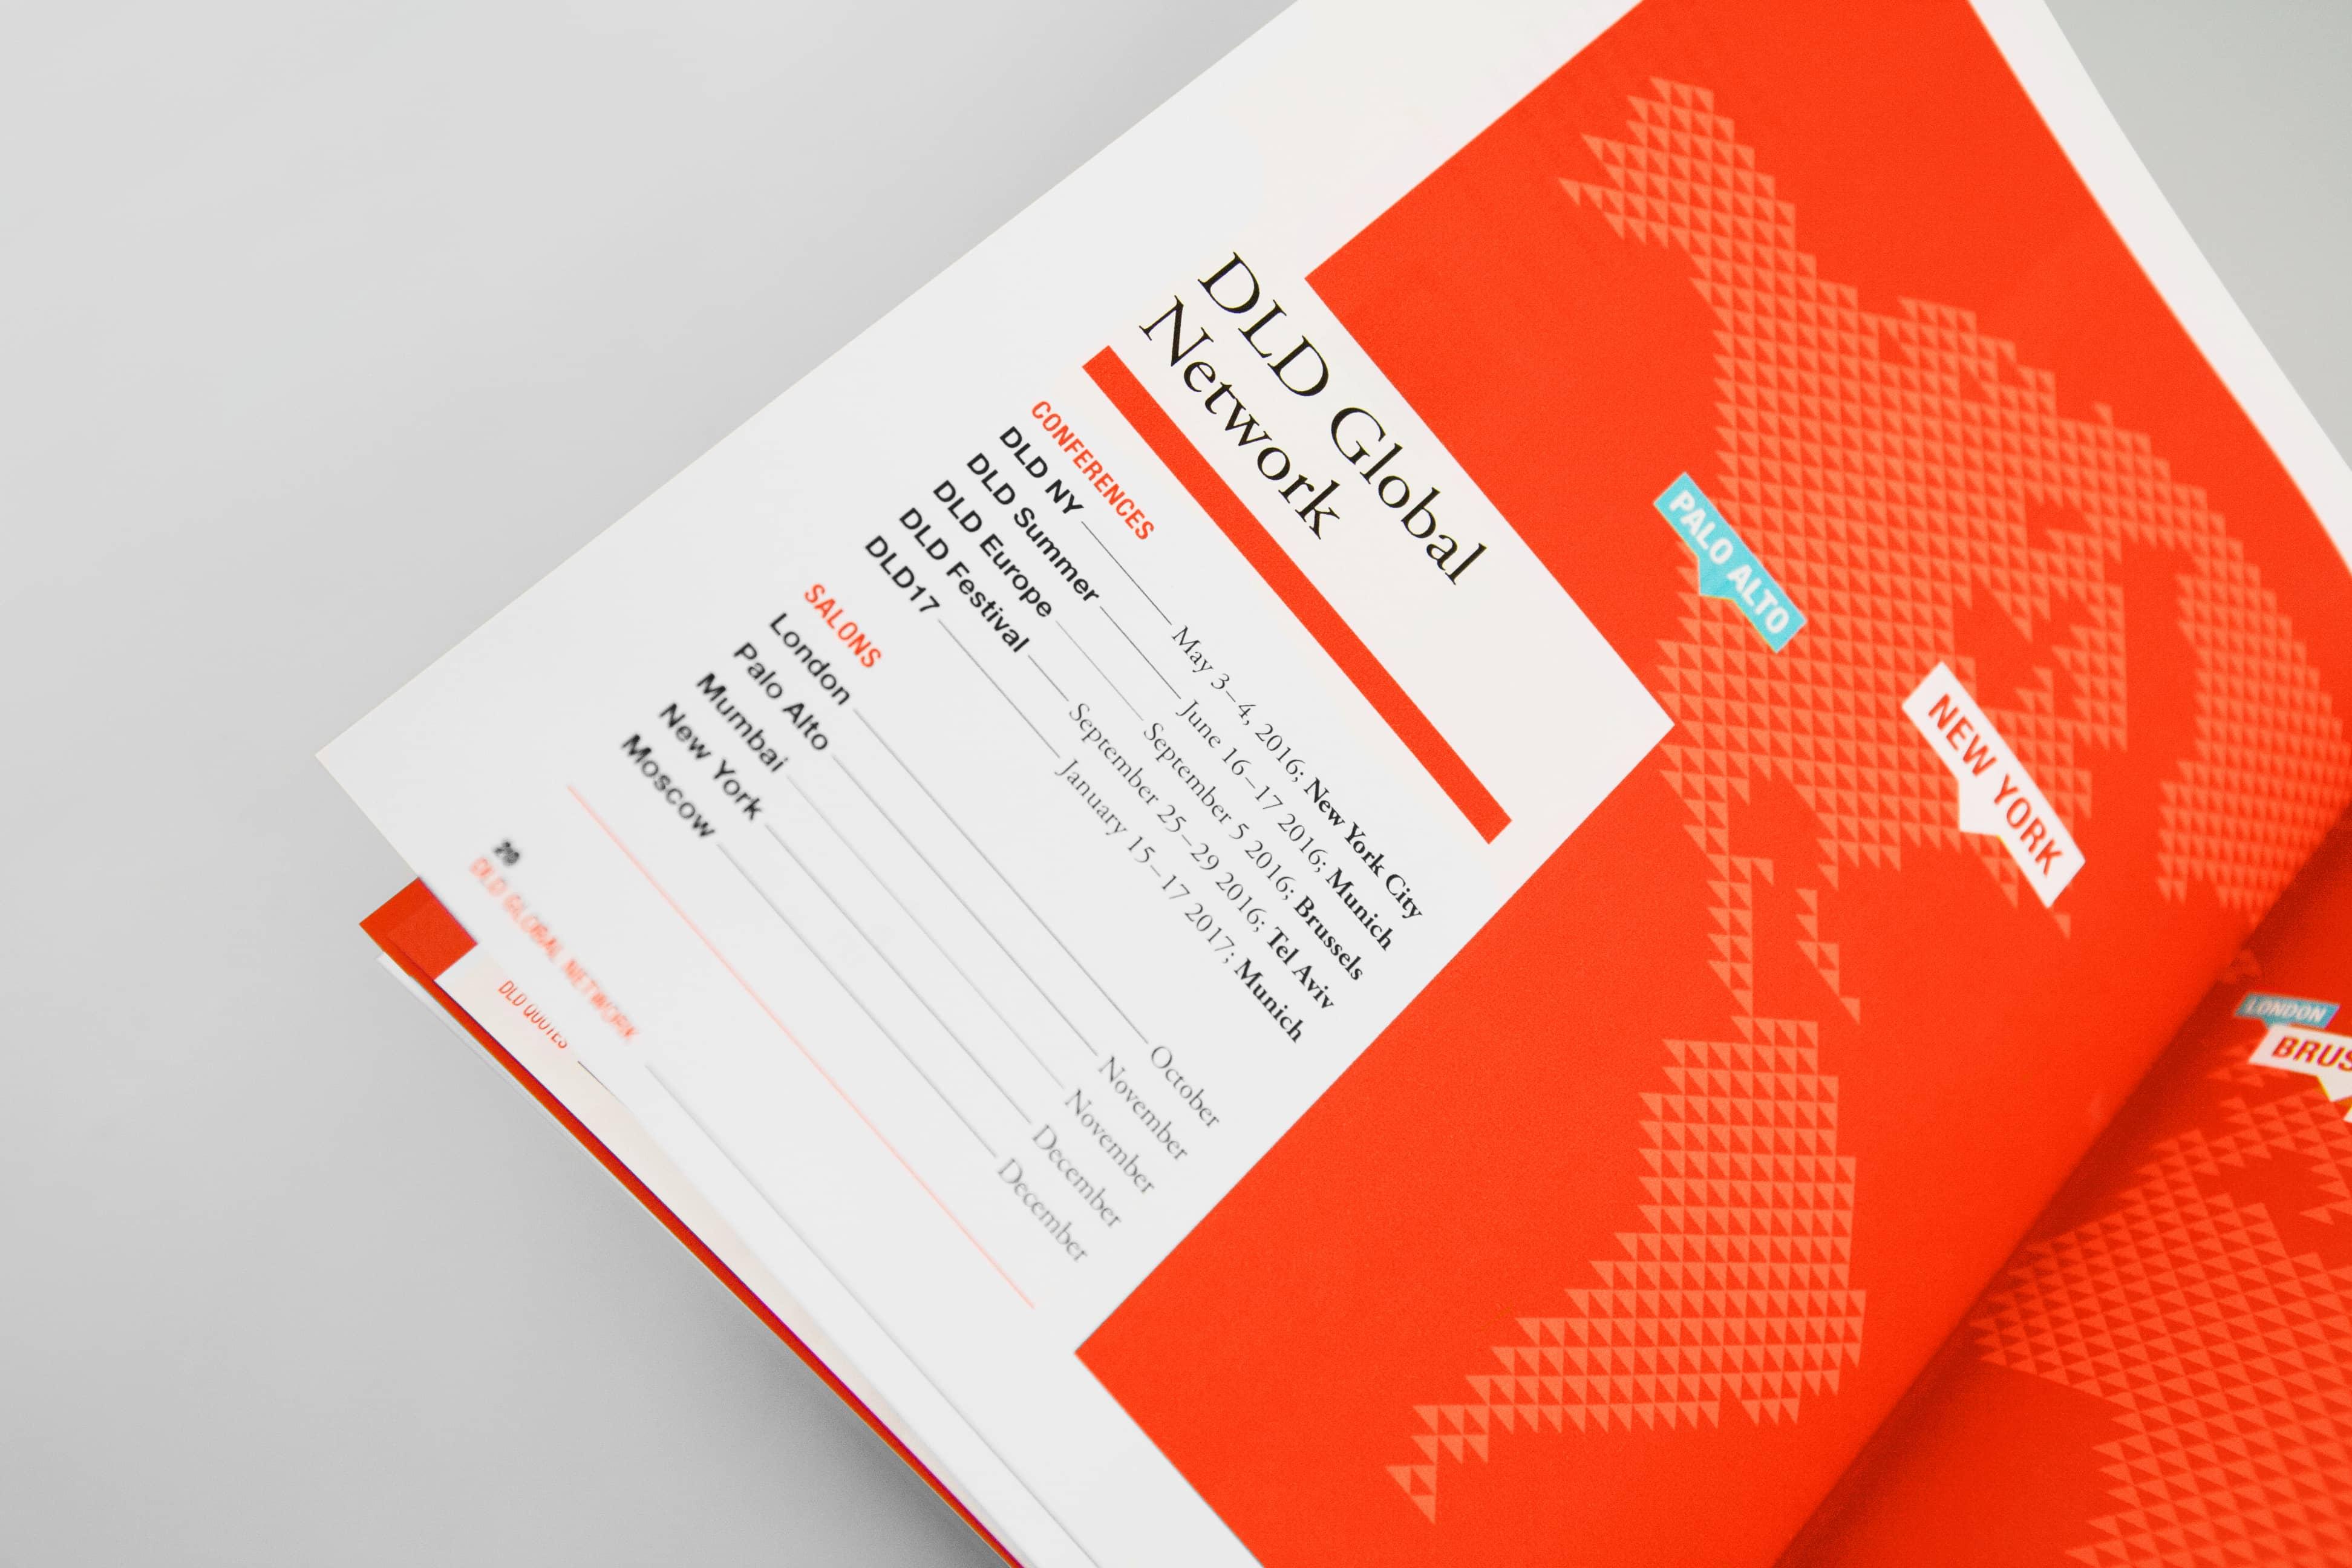 Bureau Johannes Erler – Digital Life Design